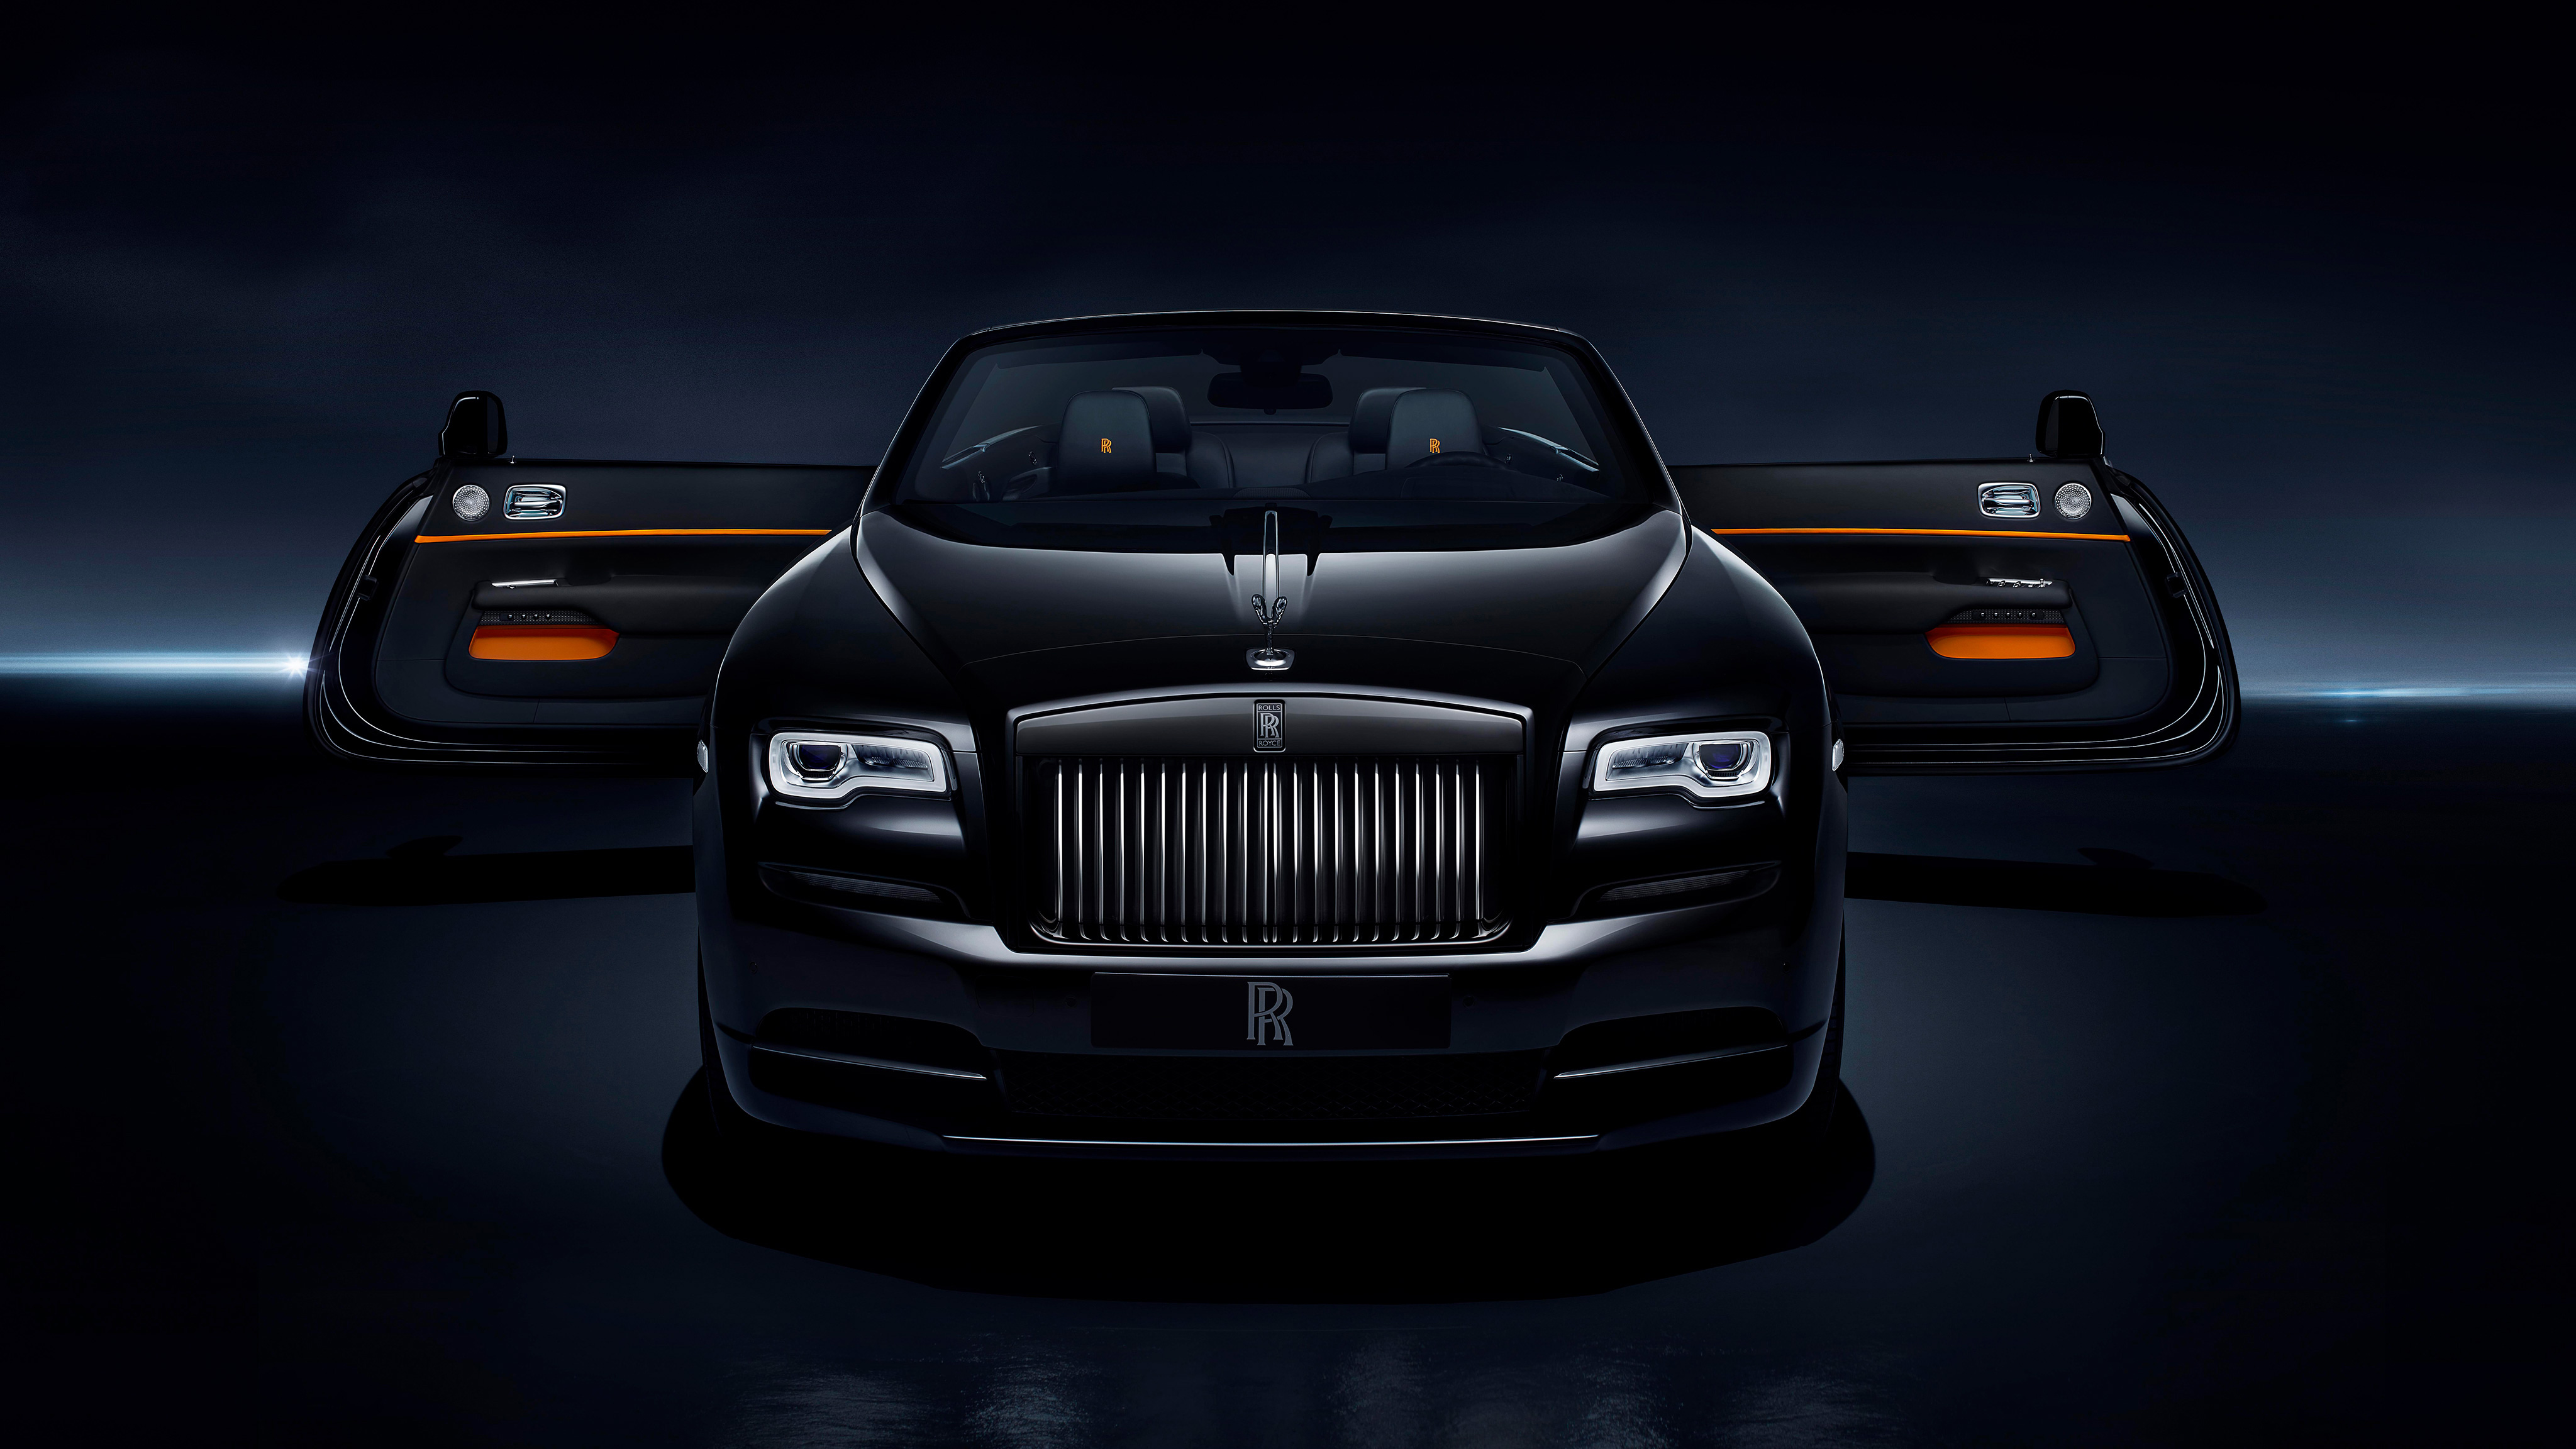 2017 Rolls Royce Dawn Black Badge 4K Wallpaper | HD Car ...